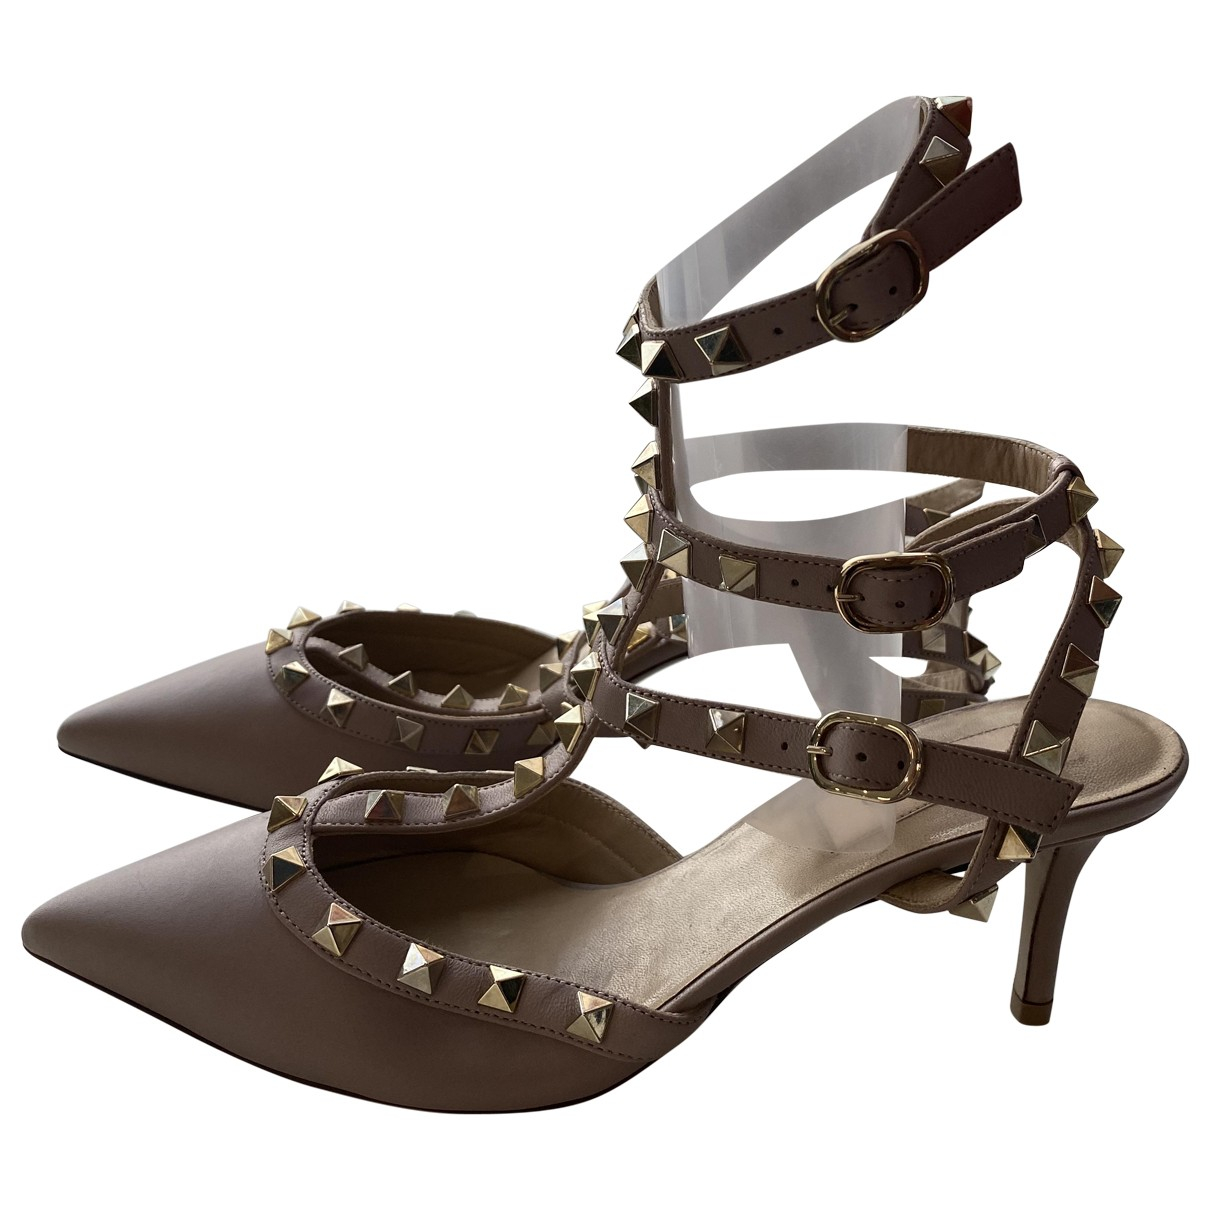 Valentino Garavani Rockstud Beige Leather Heels for Women 37.5 EU